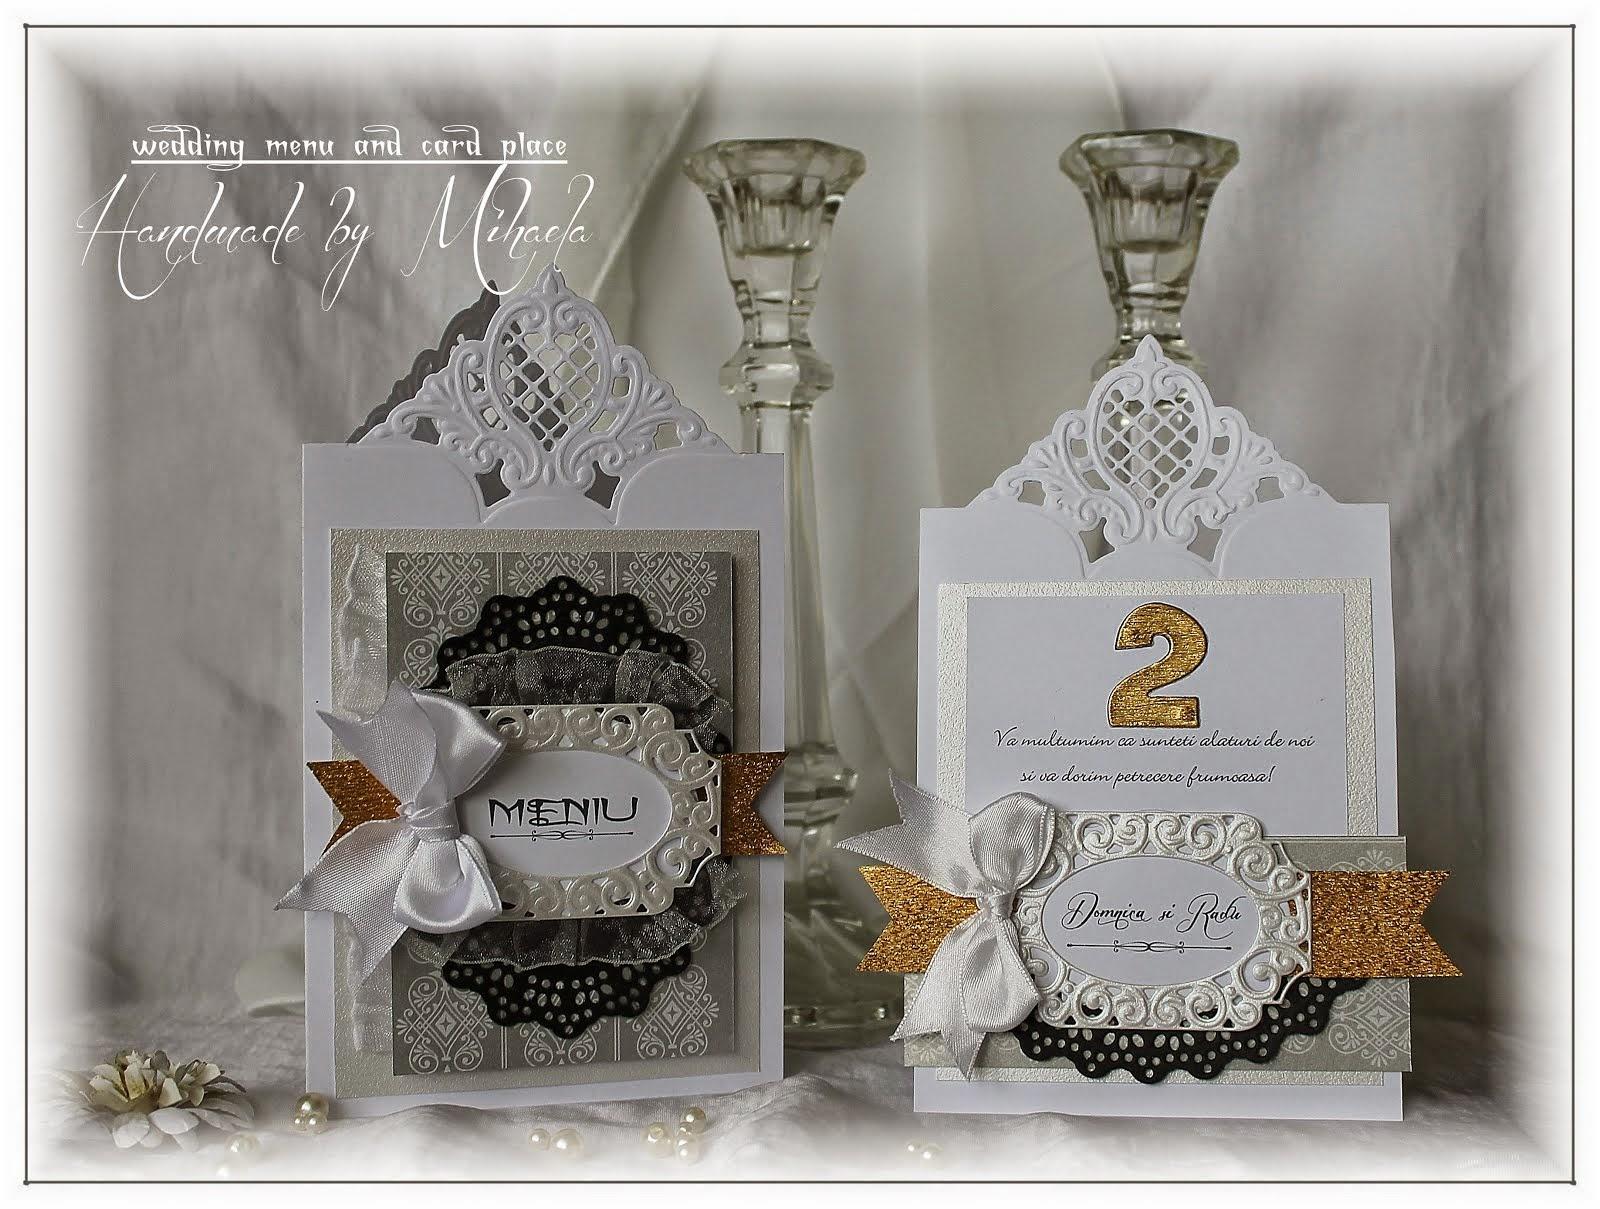 Wedding menu and place card